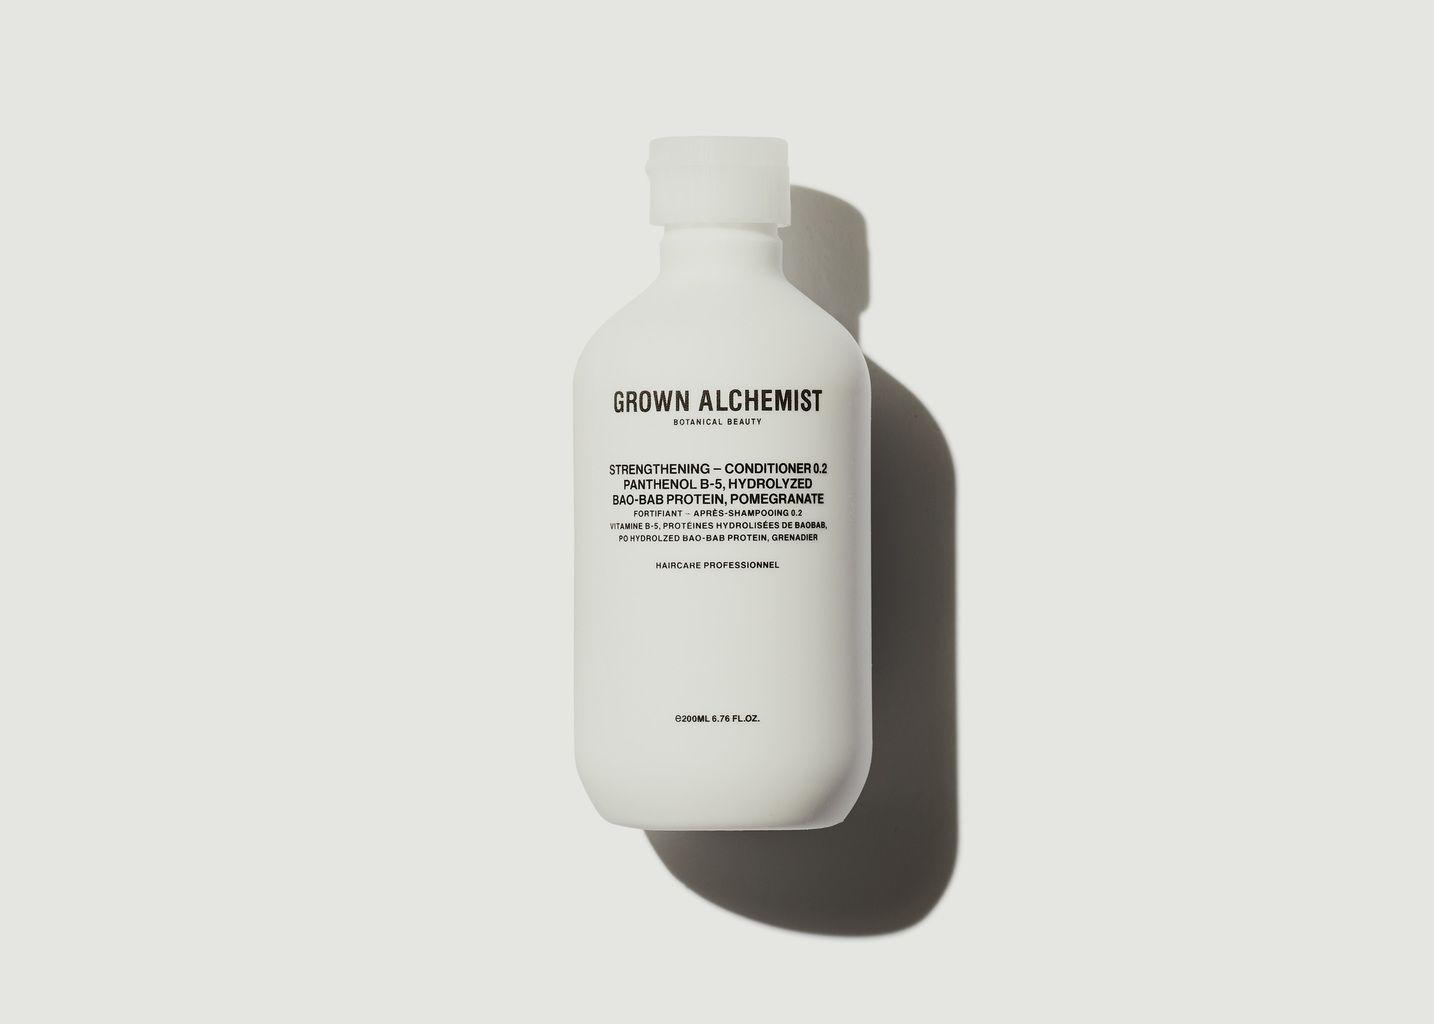 Après-shampoing fortifiant 500ml - Grown Alchemist